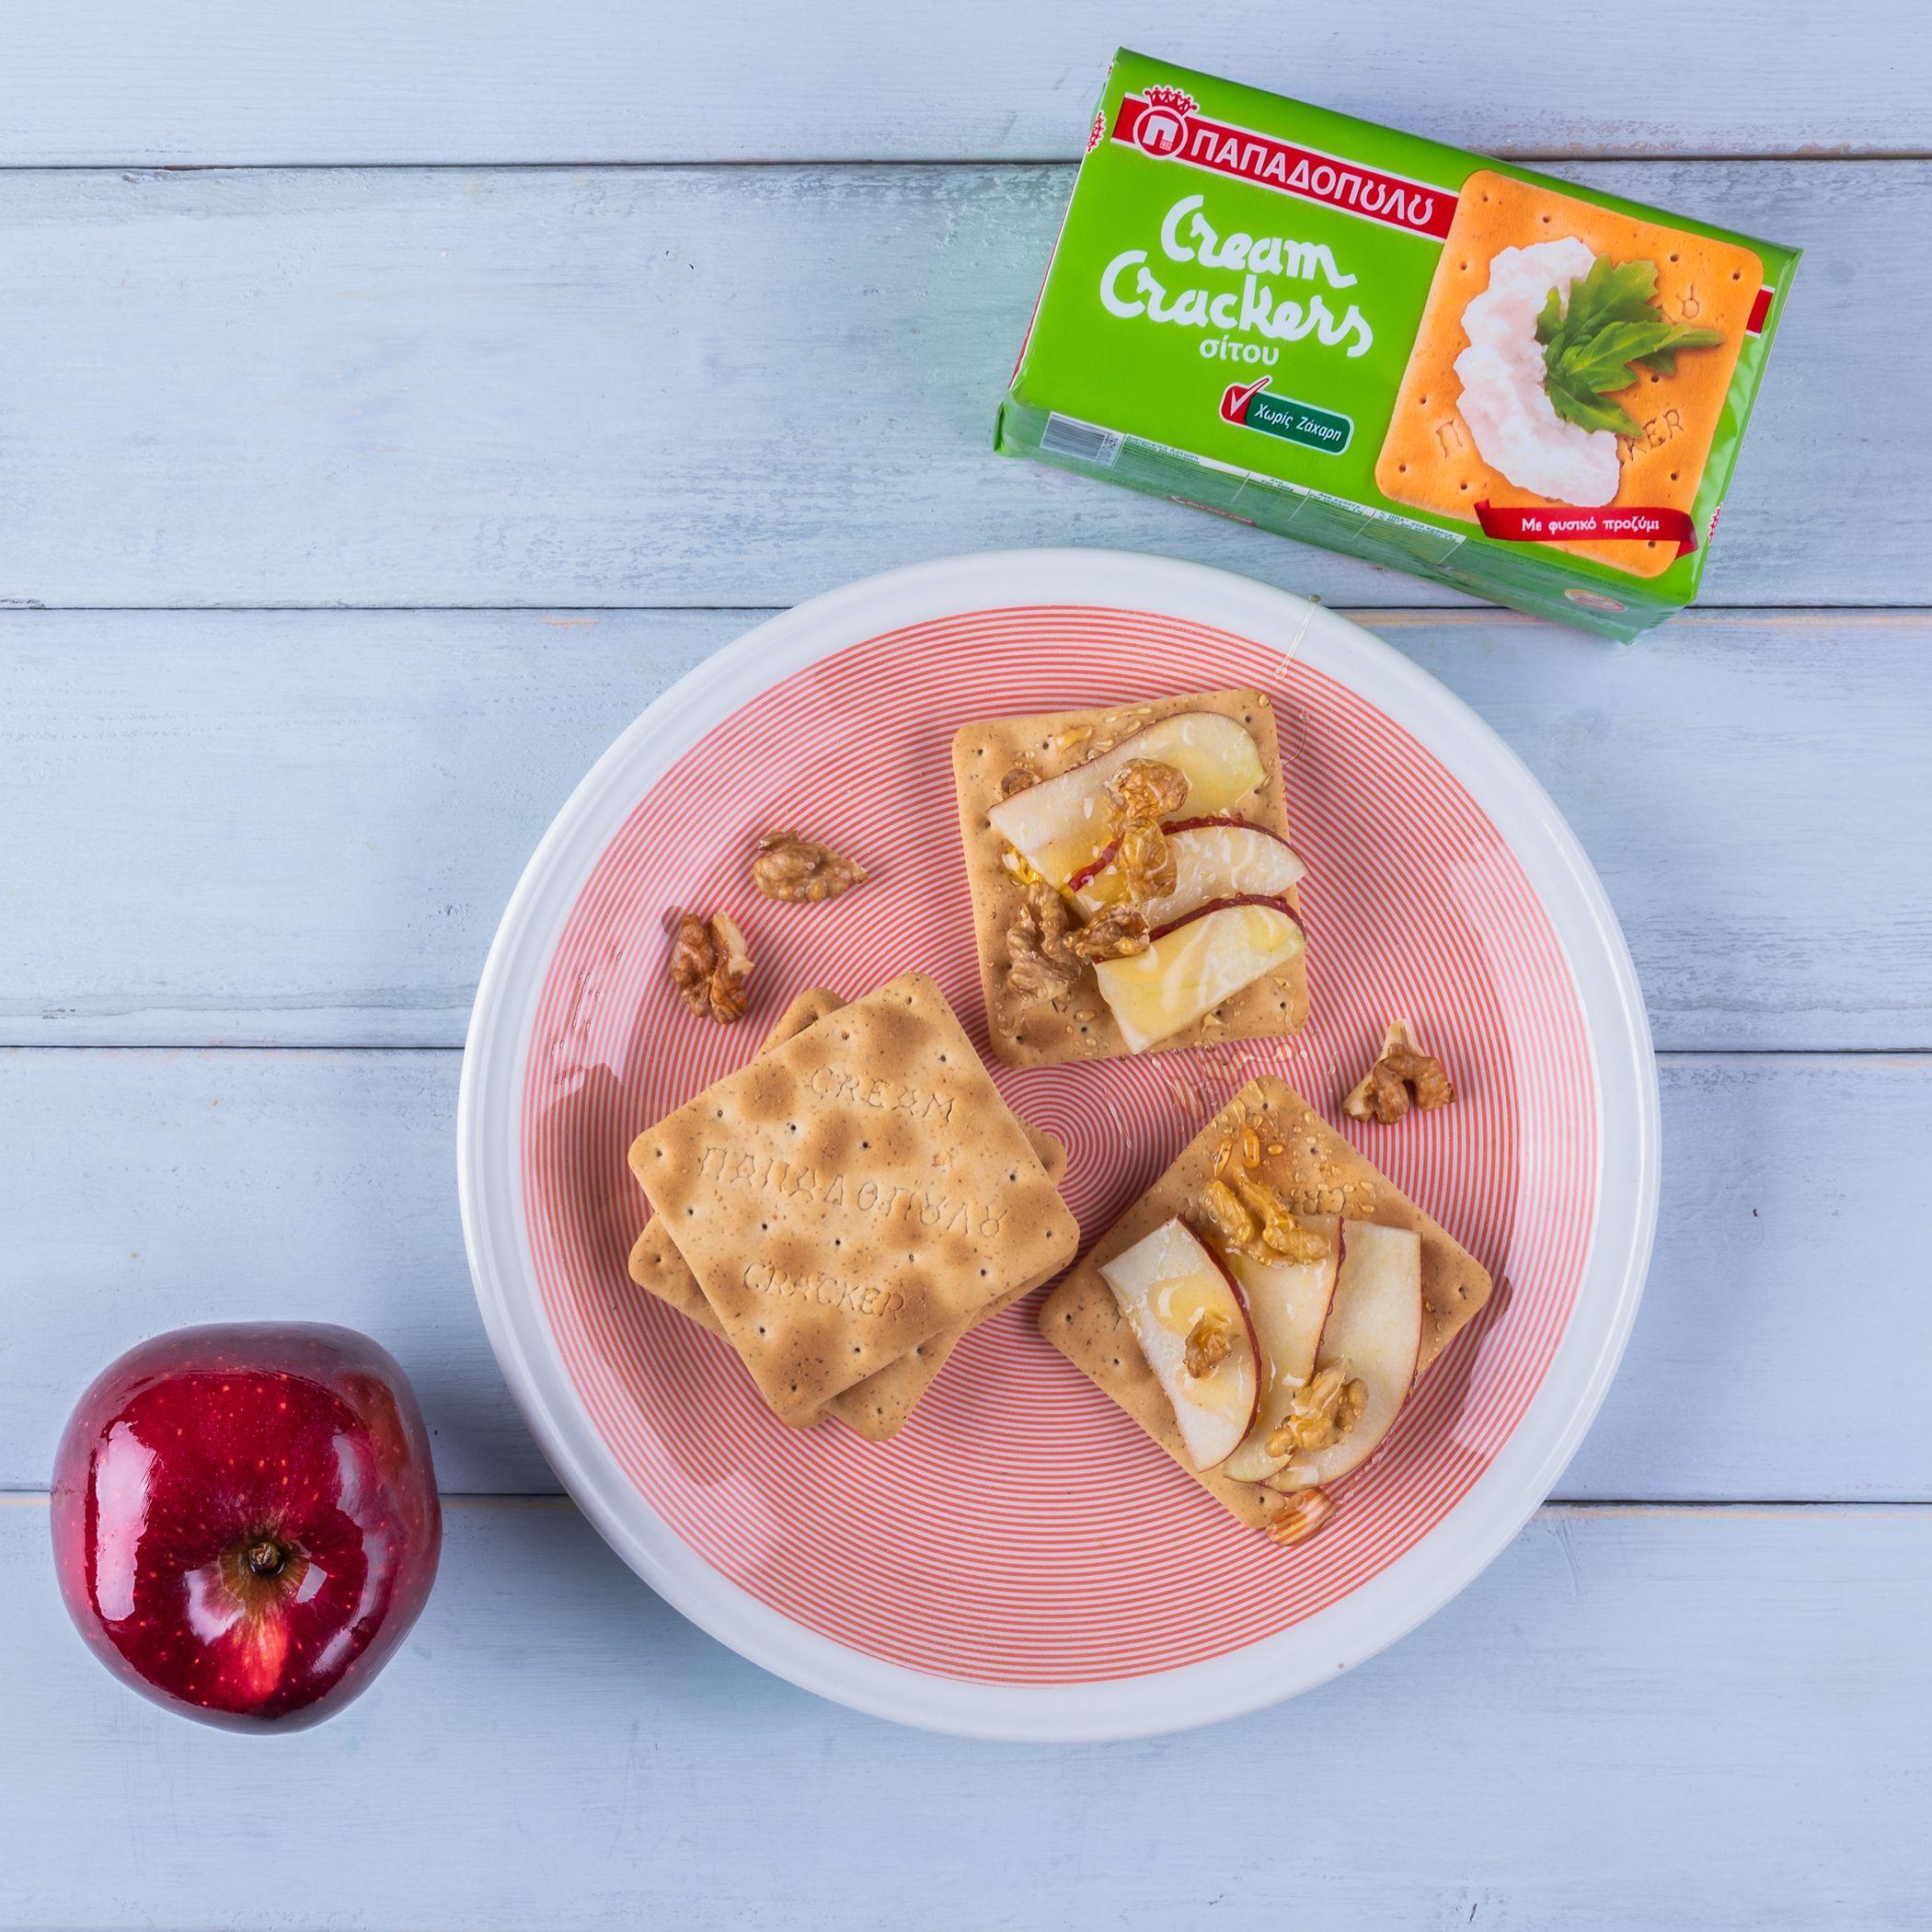 Featured image for Θρεπτικό πρωινό με Cream Crackers Παπαδοπούλου χωρίς ζάχαρη